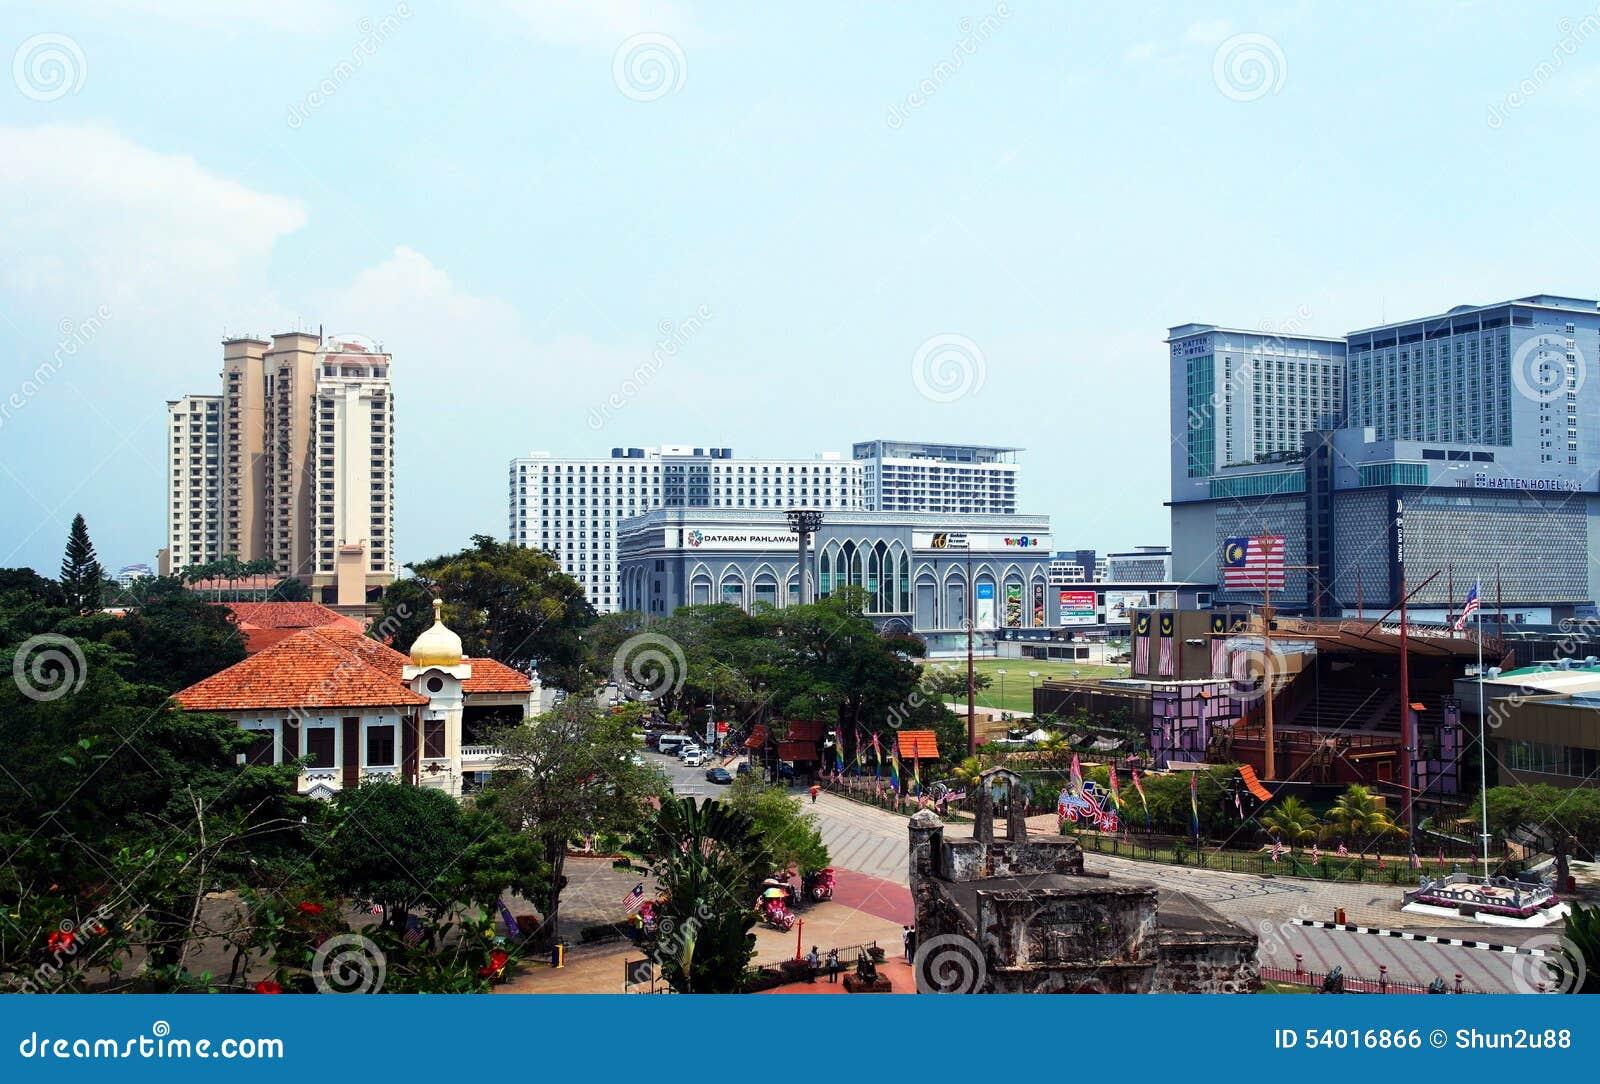 Perlis city